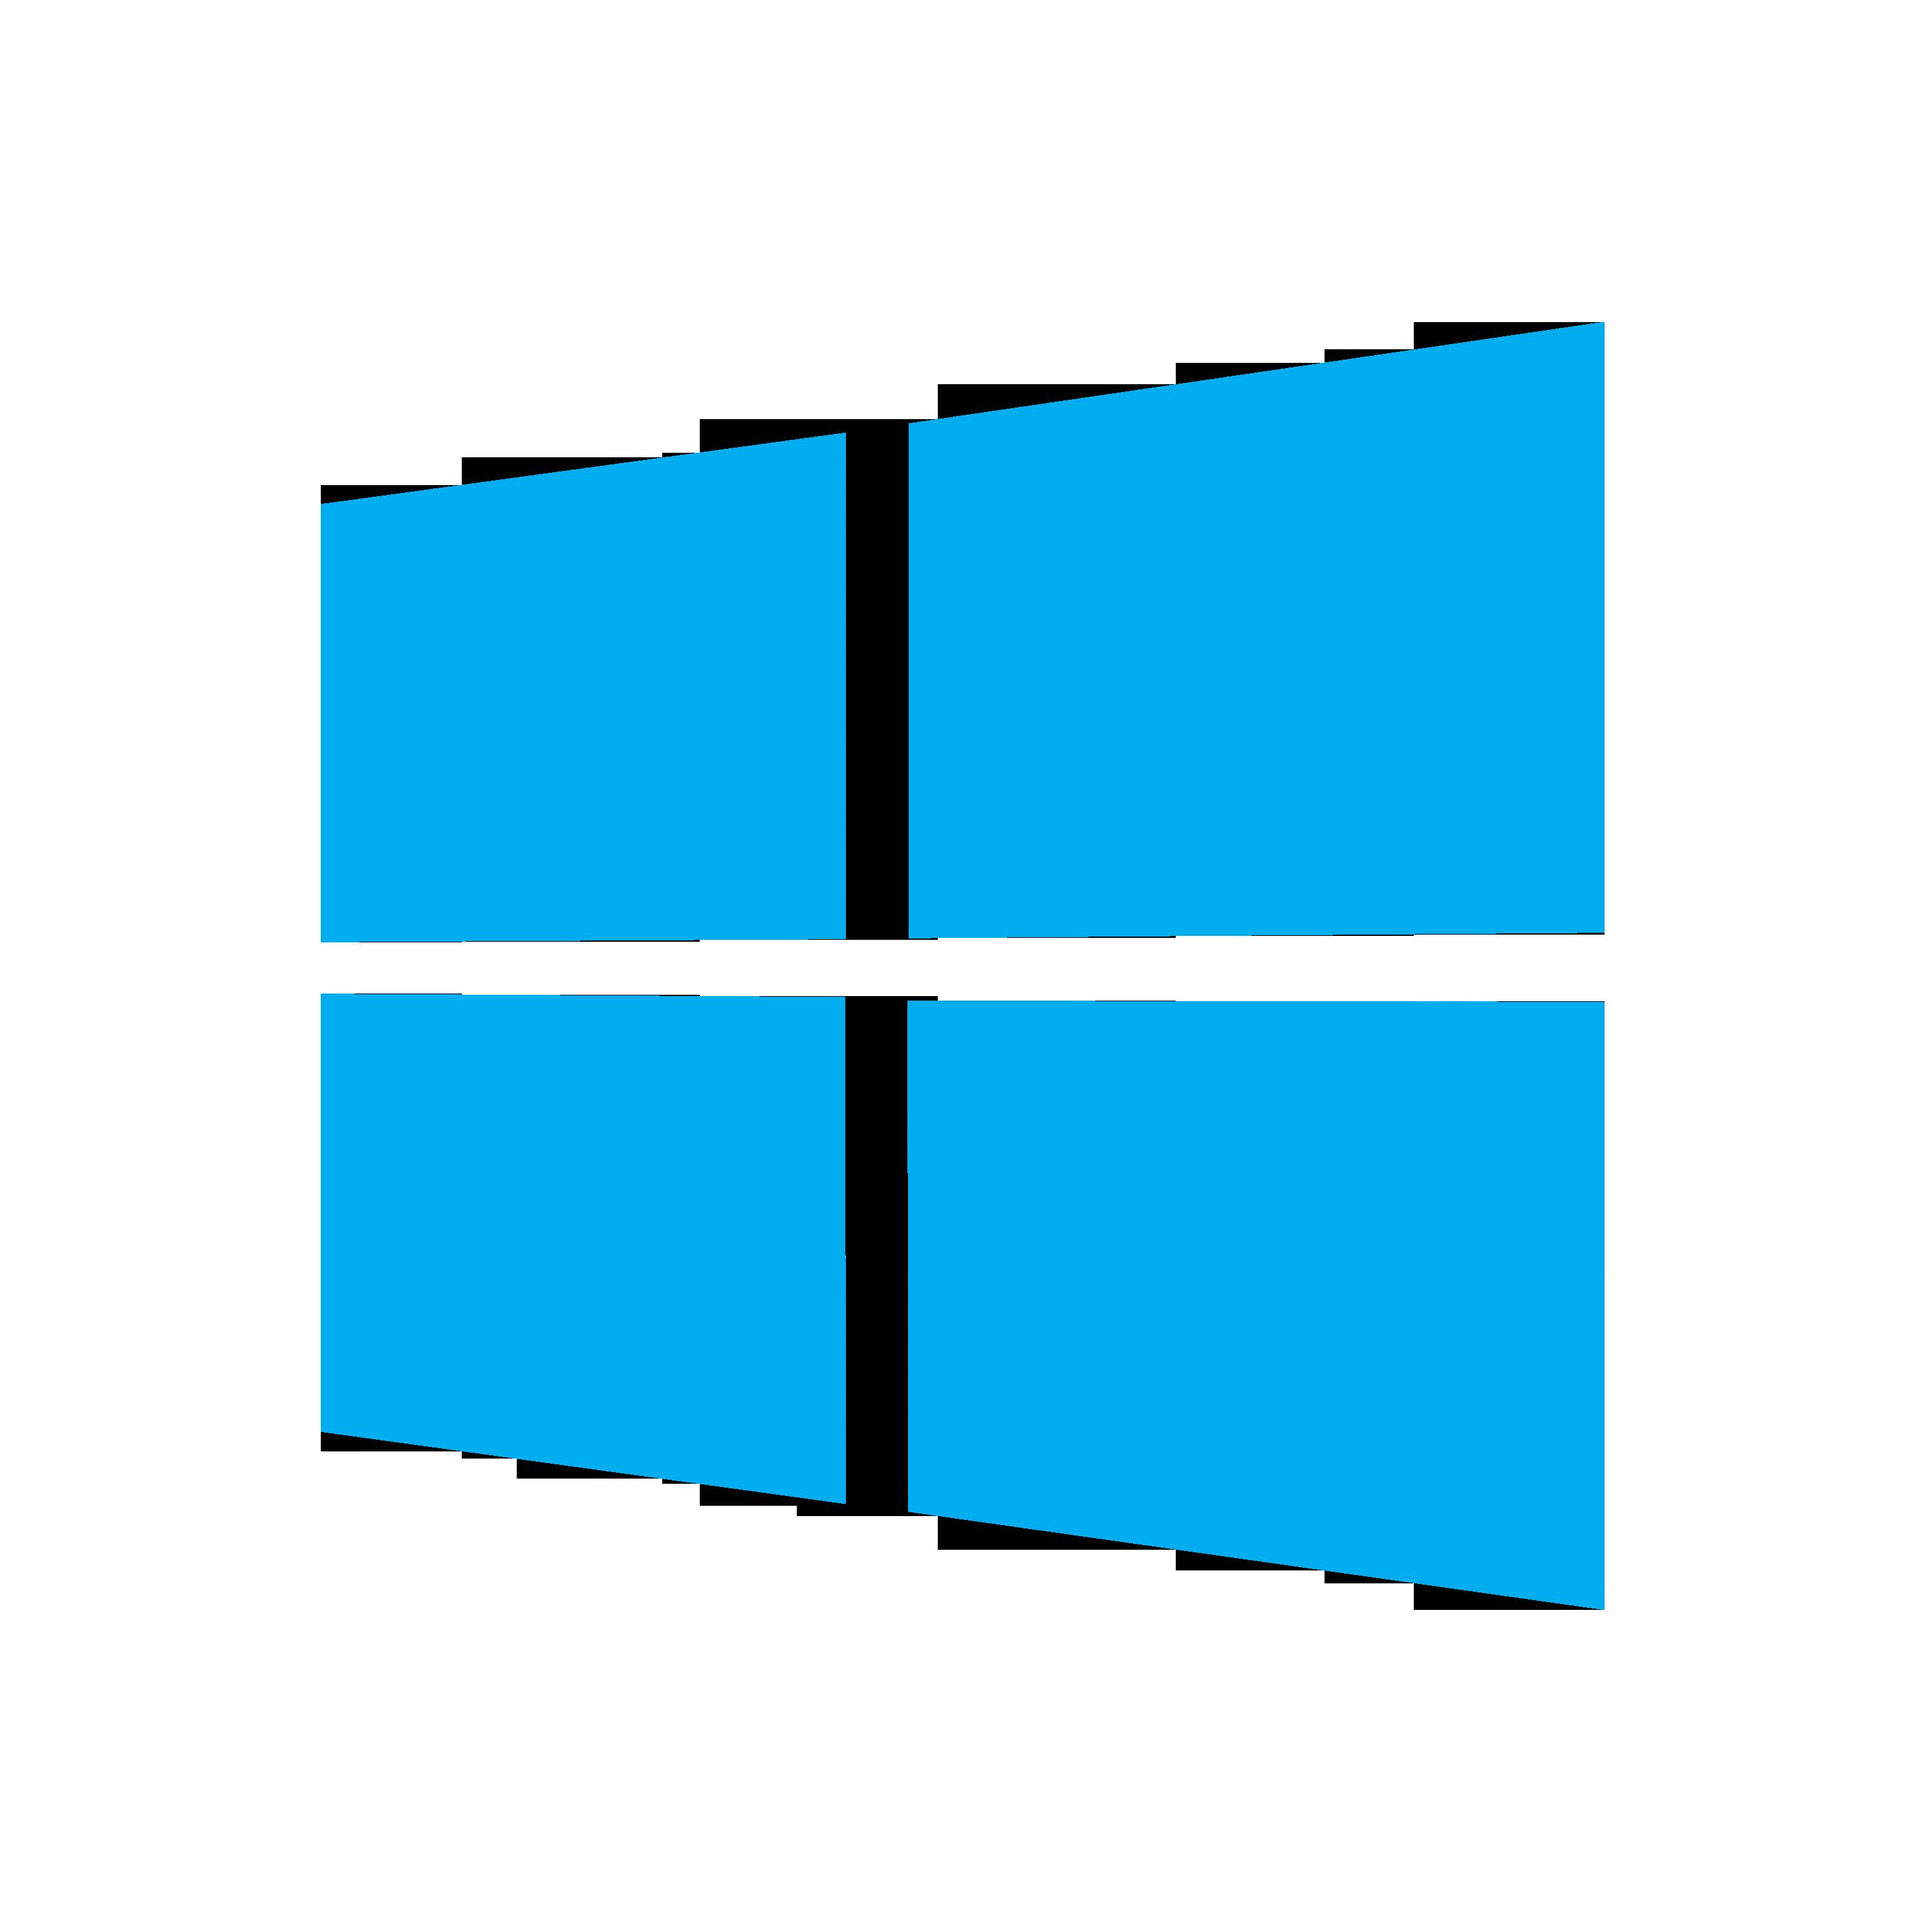 microsfoft-windows